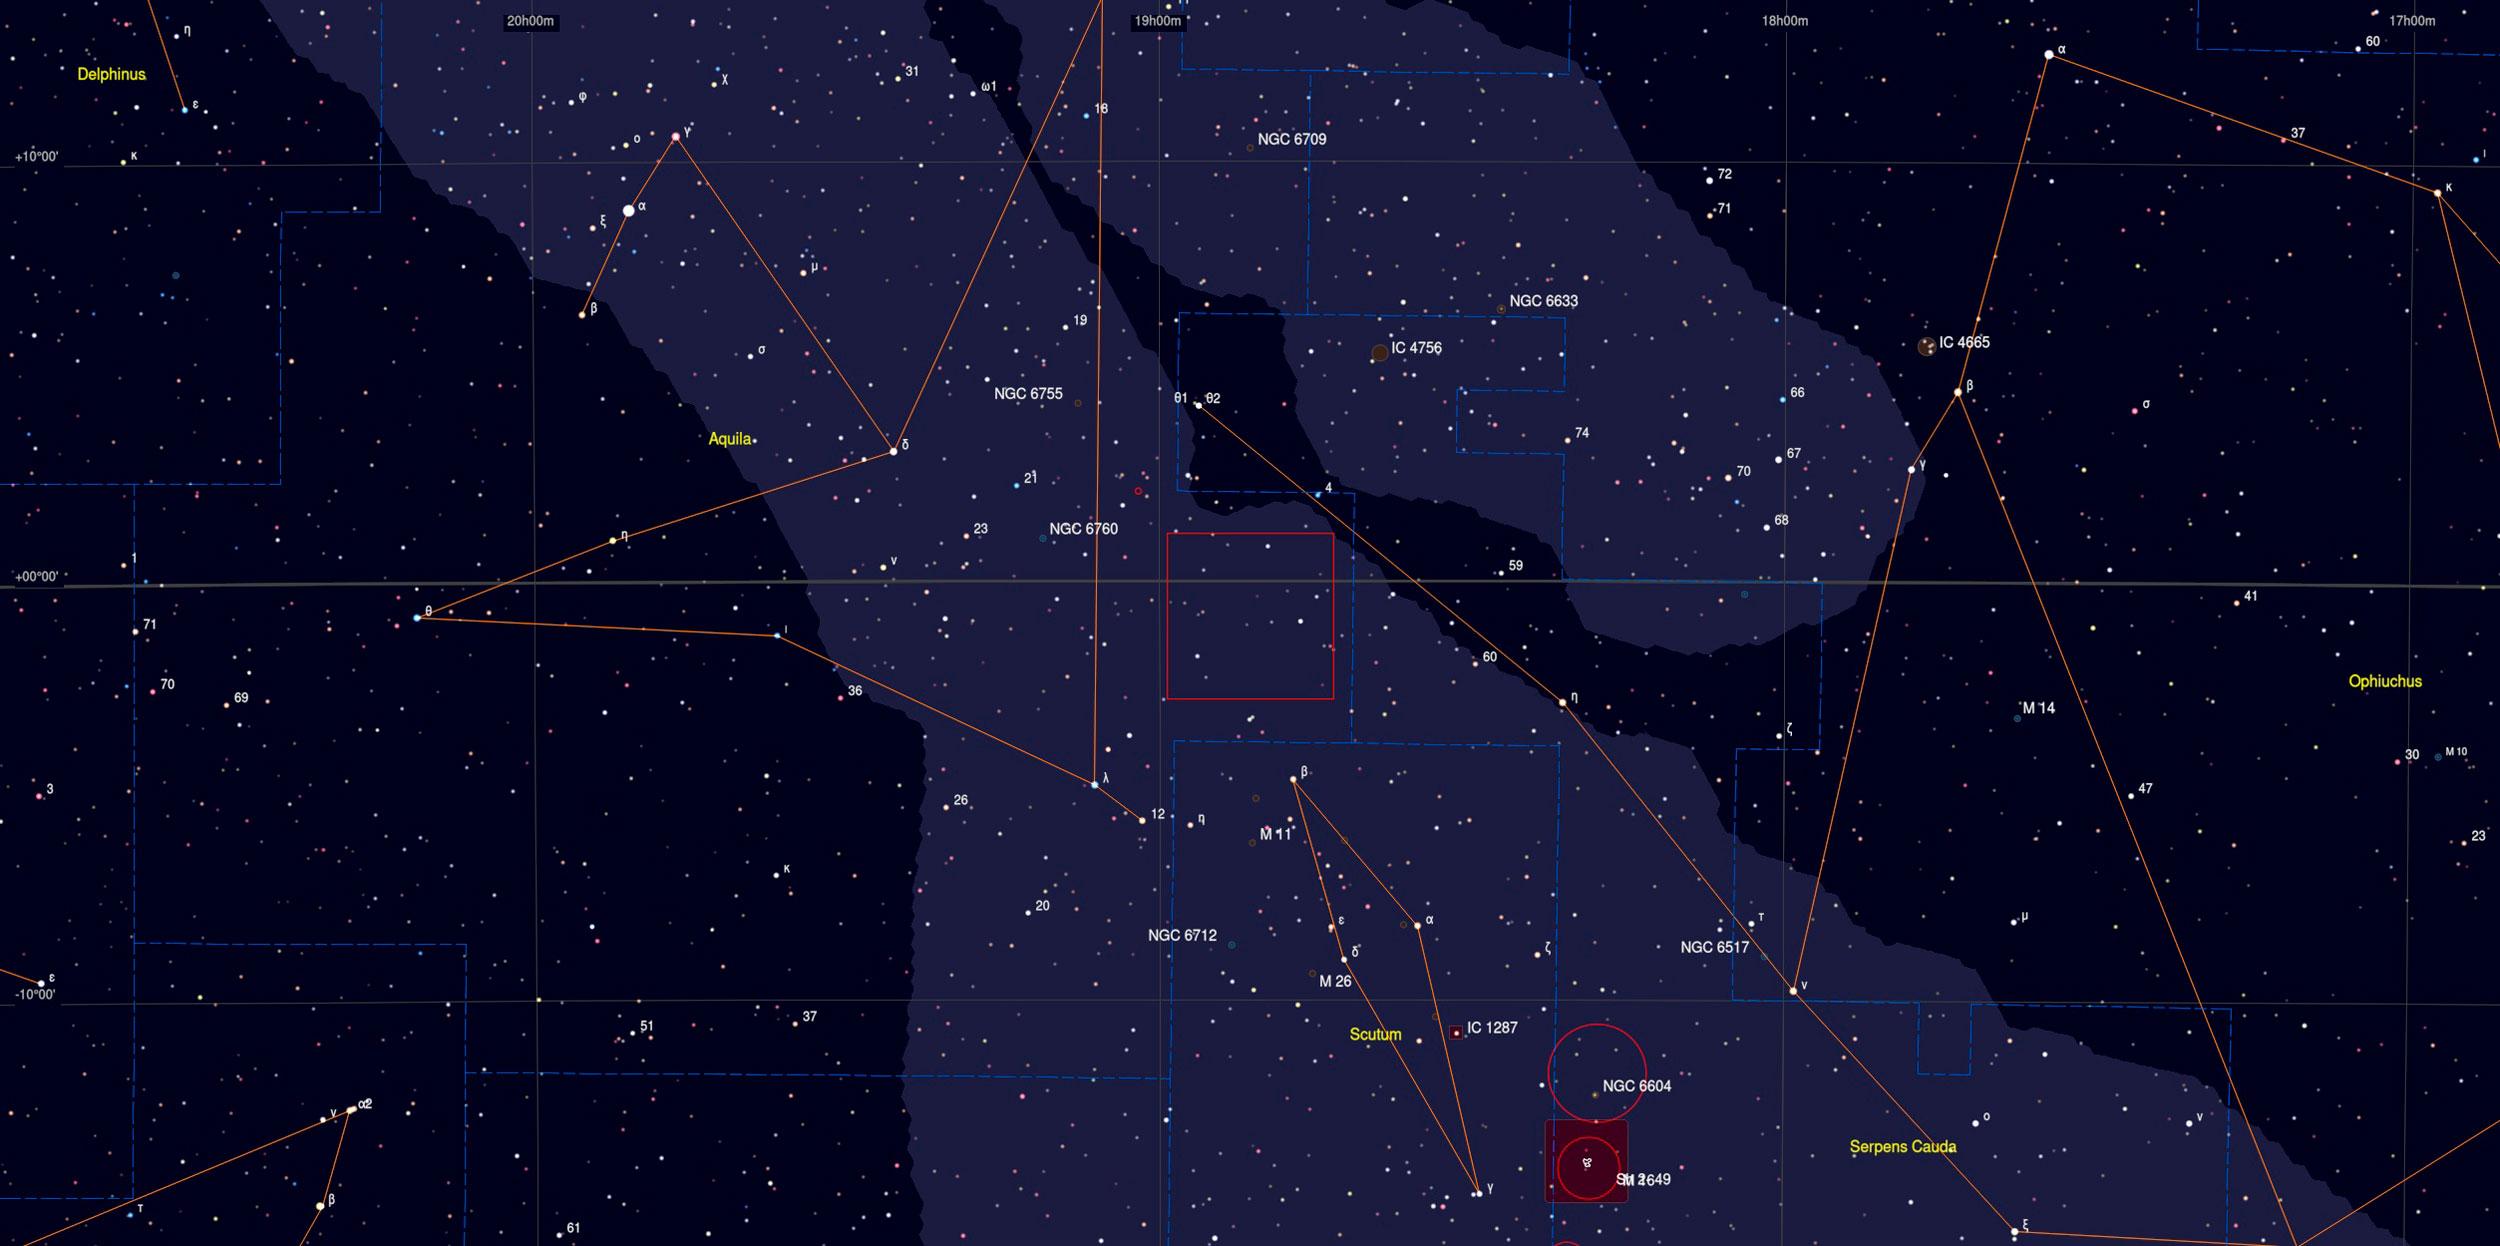 LBN 380 Region Sky Chart - Astrophotography Martin Rusterholz